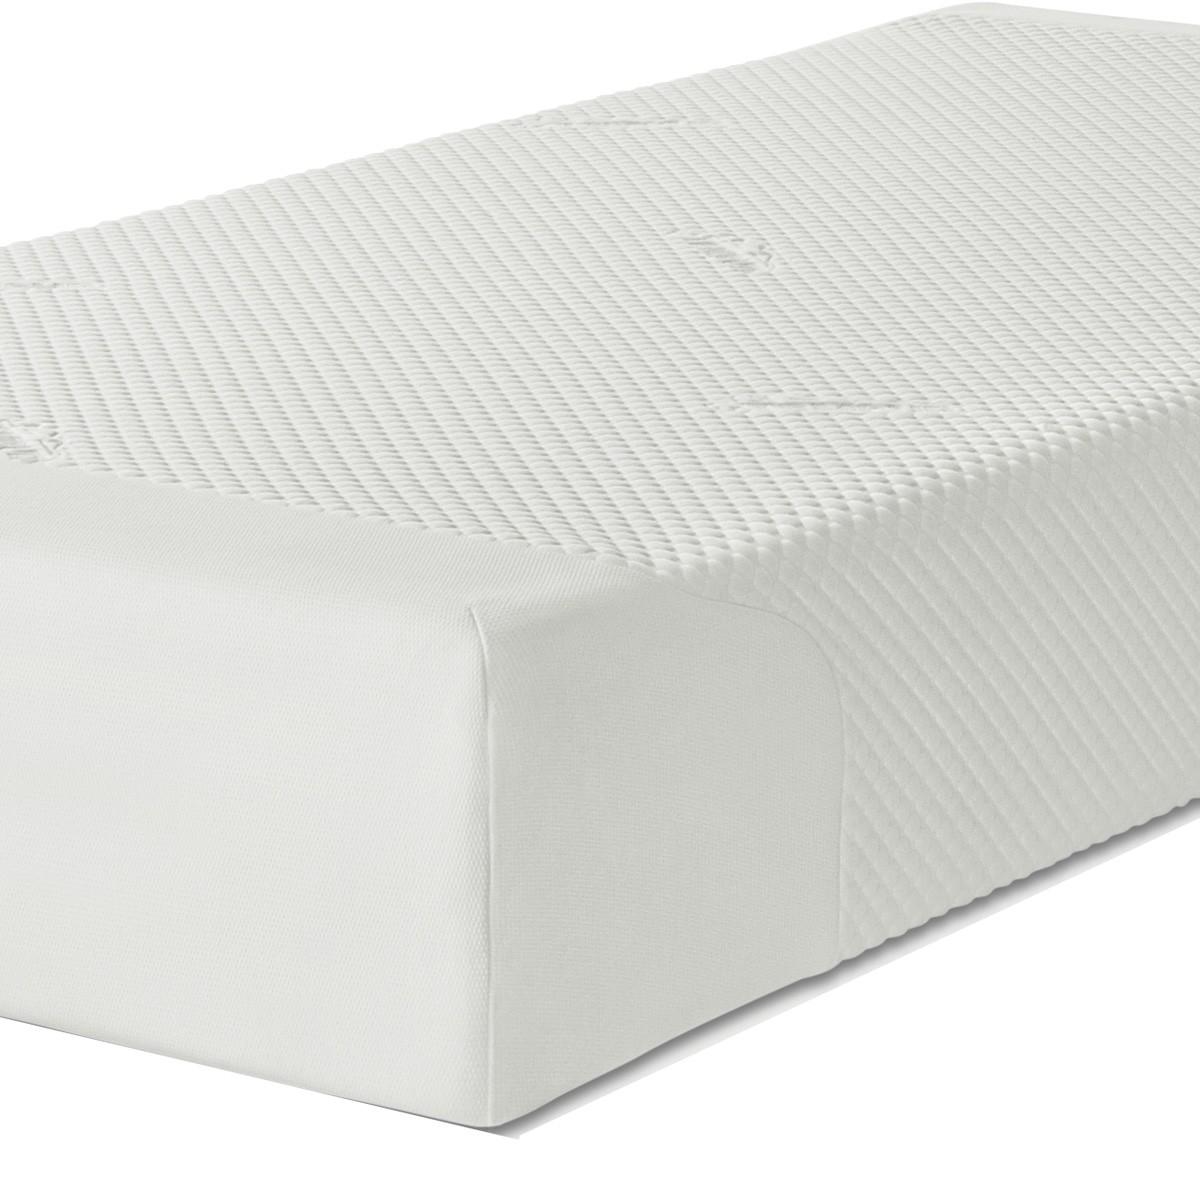 cloud mattress 19 cm tempur tempur mattresses. Black Bedroom Furniture Sets. Home Design Ideas